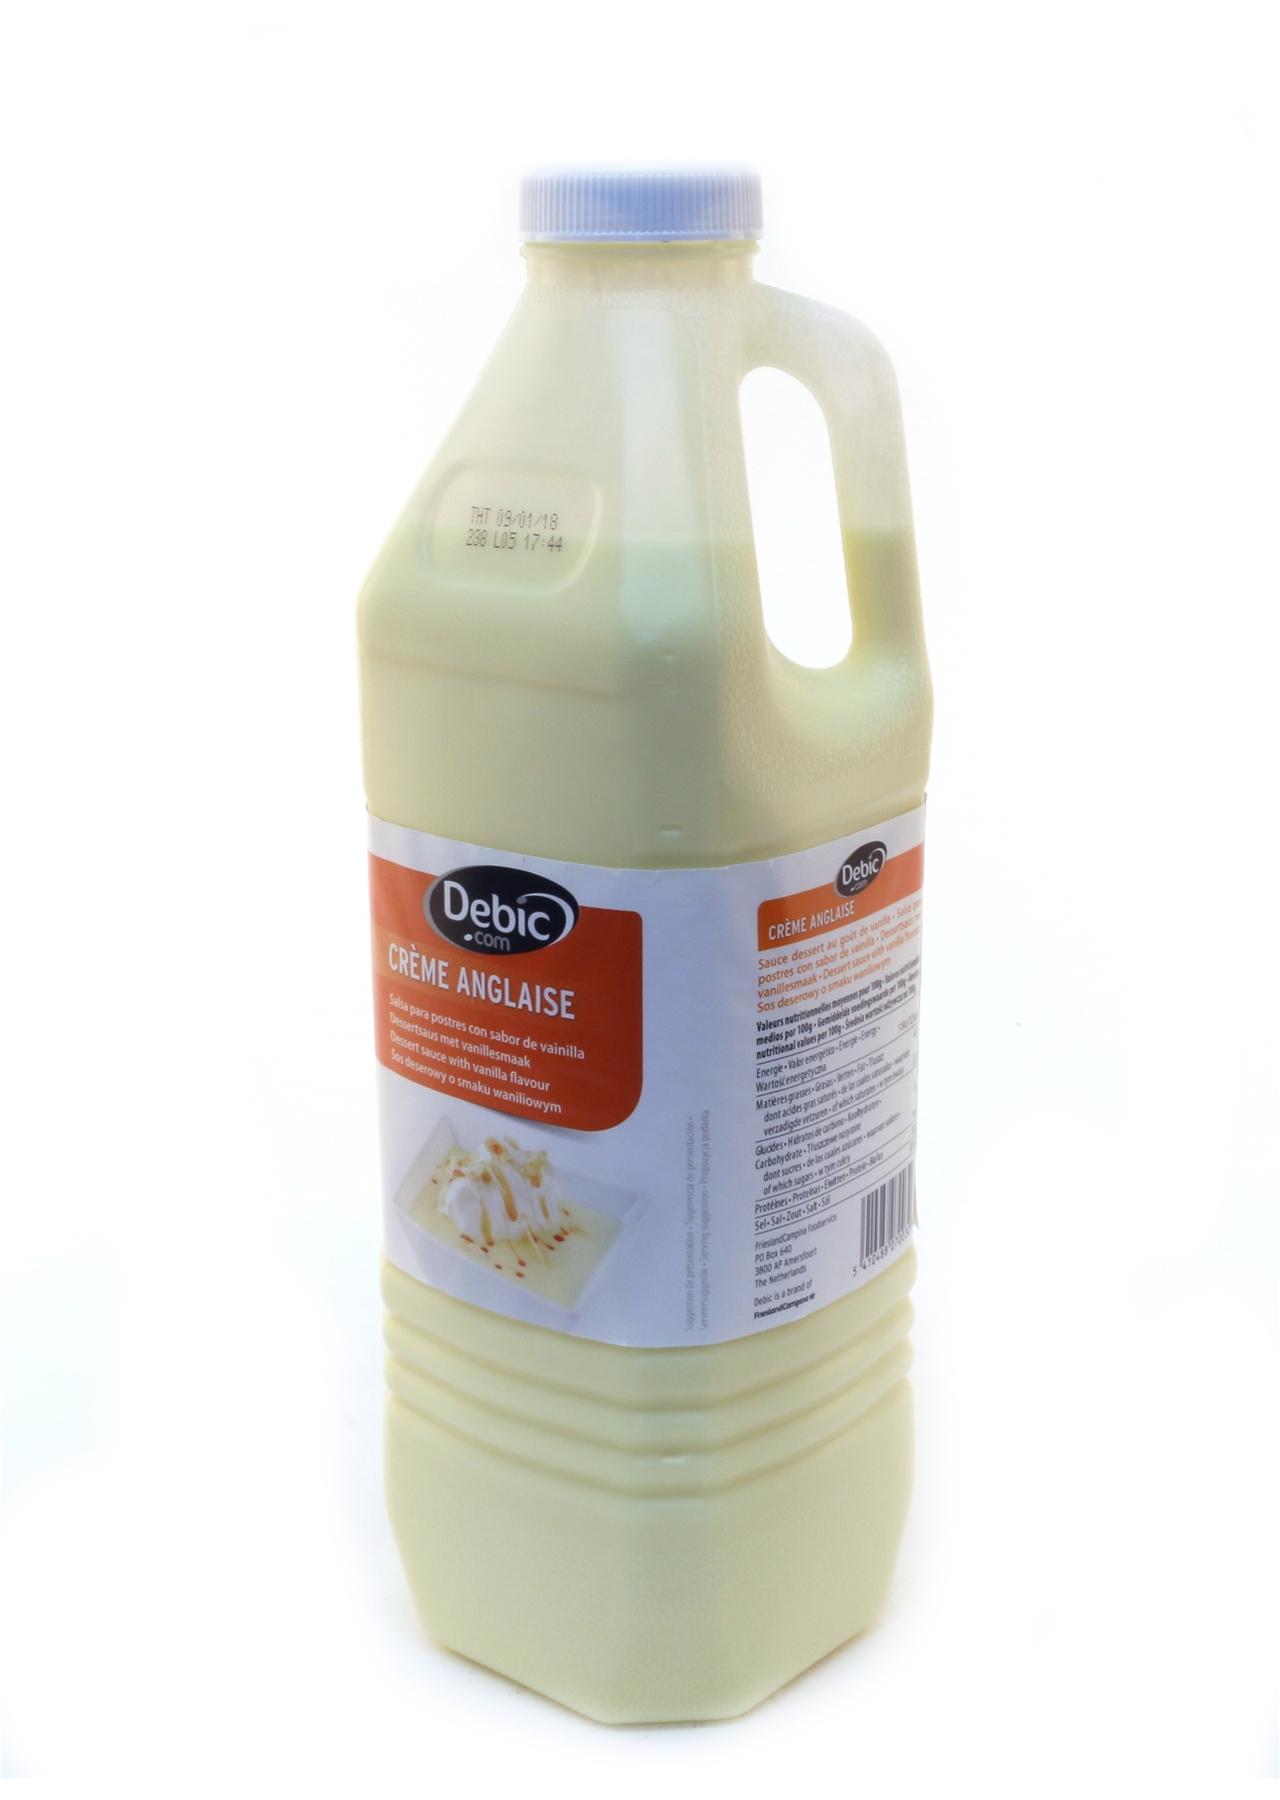 Creme Anglaise Debic | 2lt | BD Foods wholesale food company | BD Foods